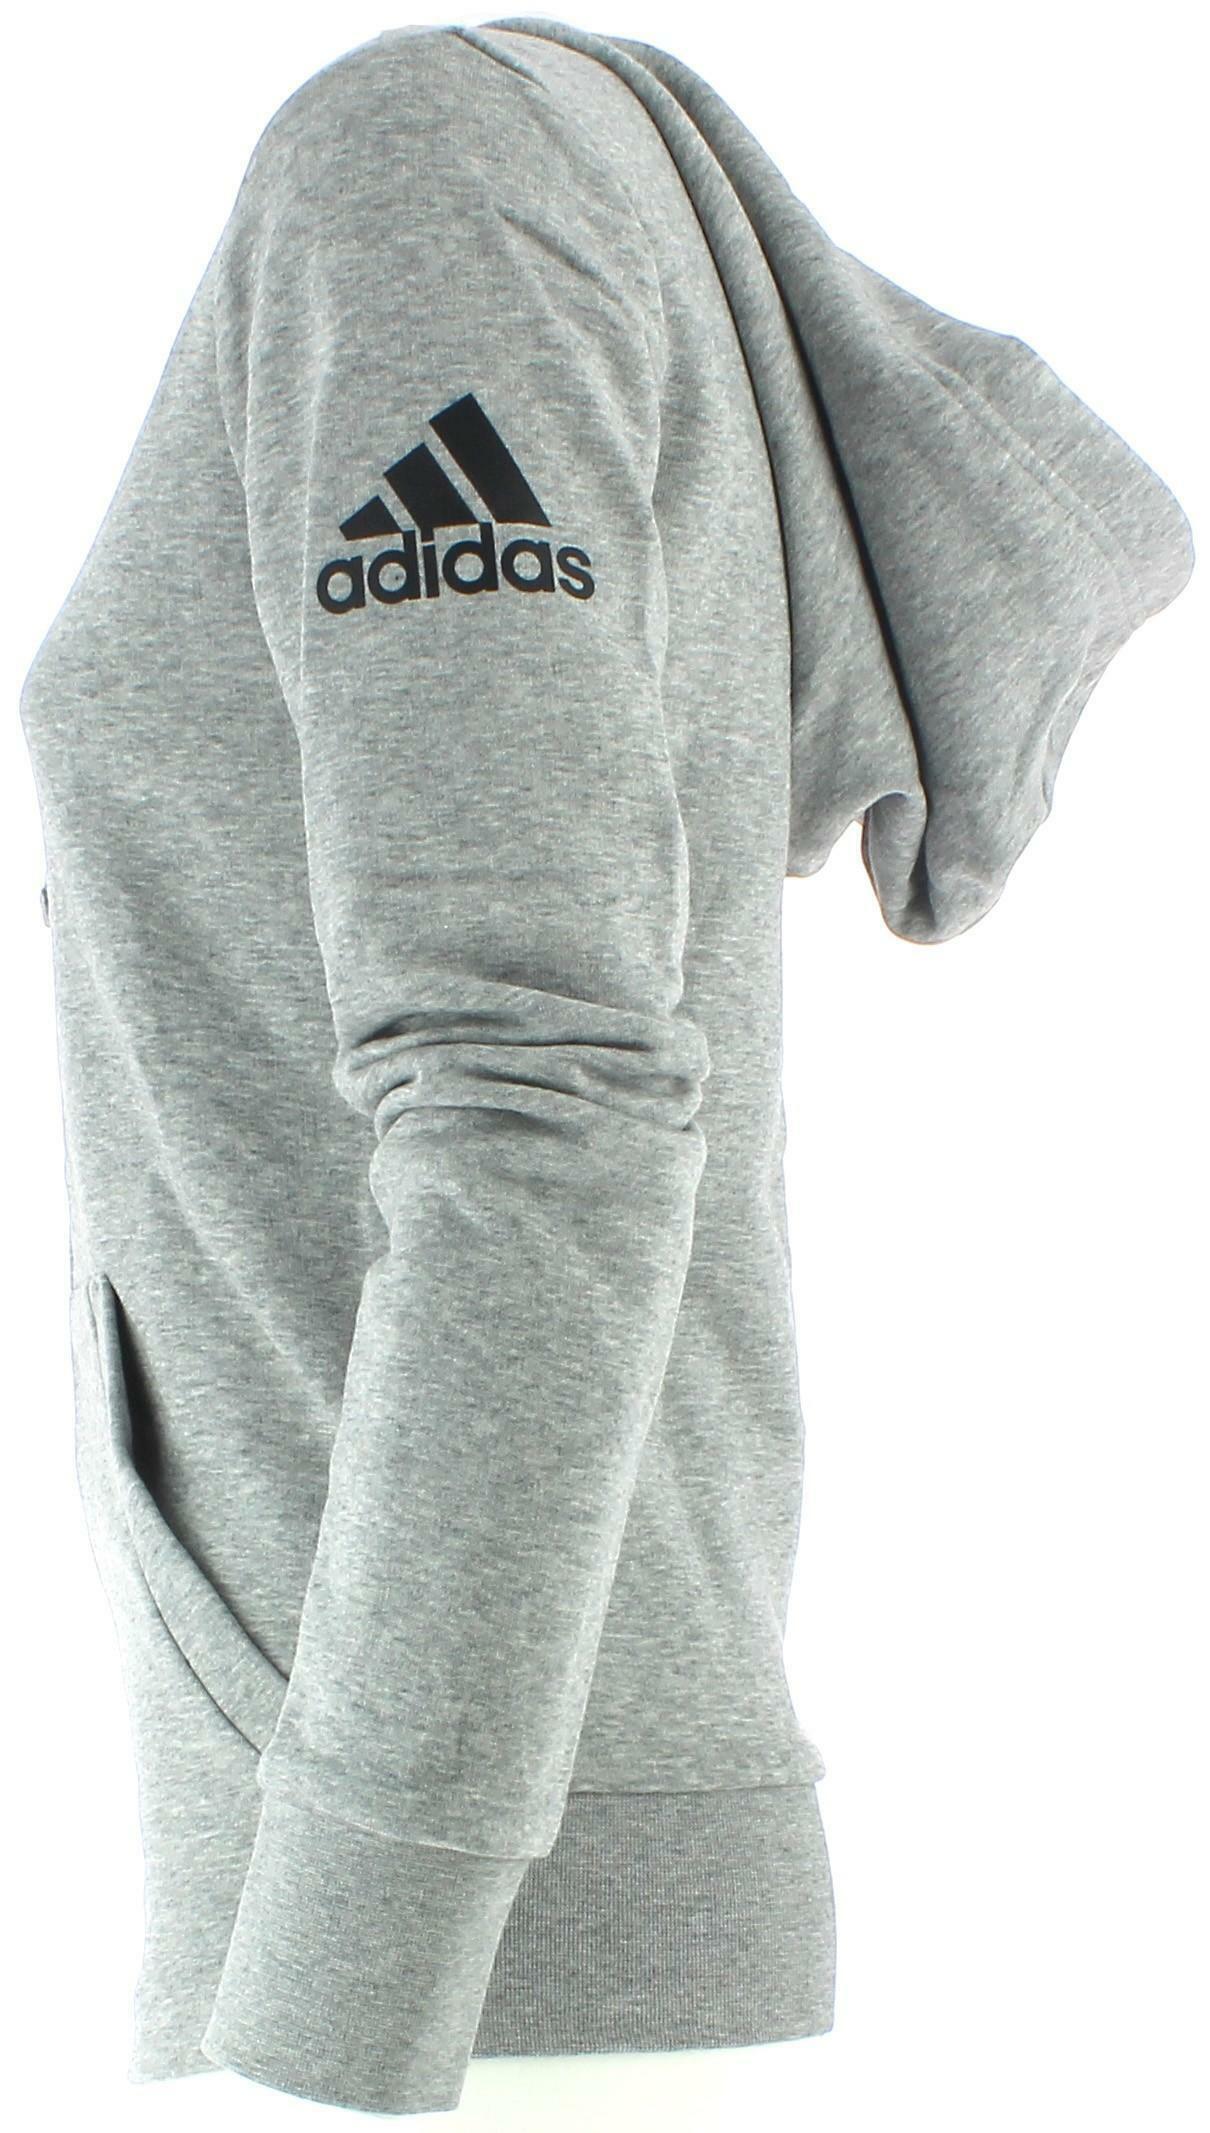 adidas adidas solid fz felpa donna zip grigia s97086